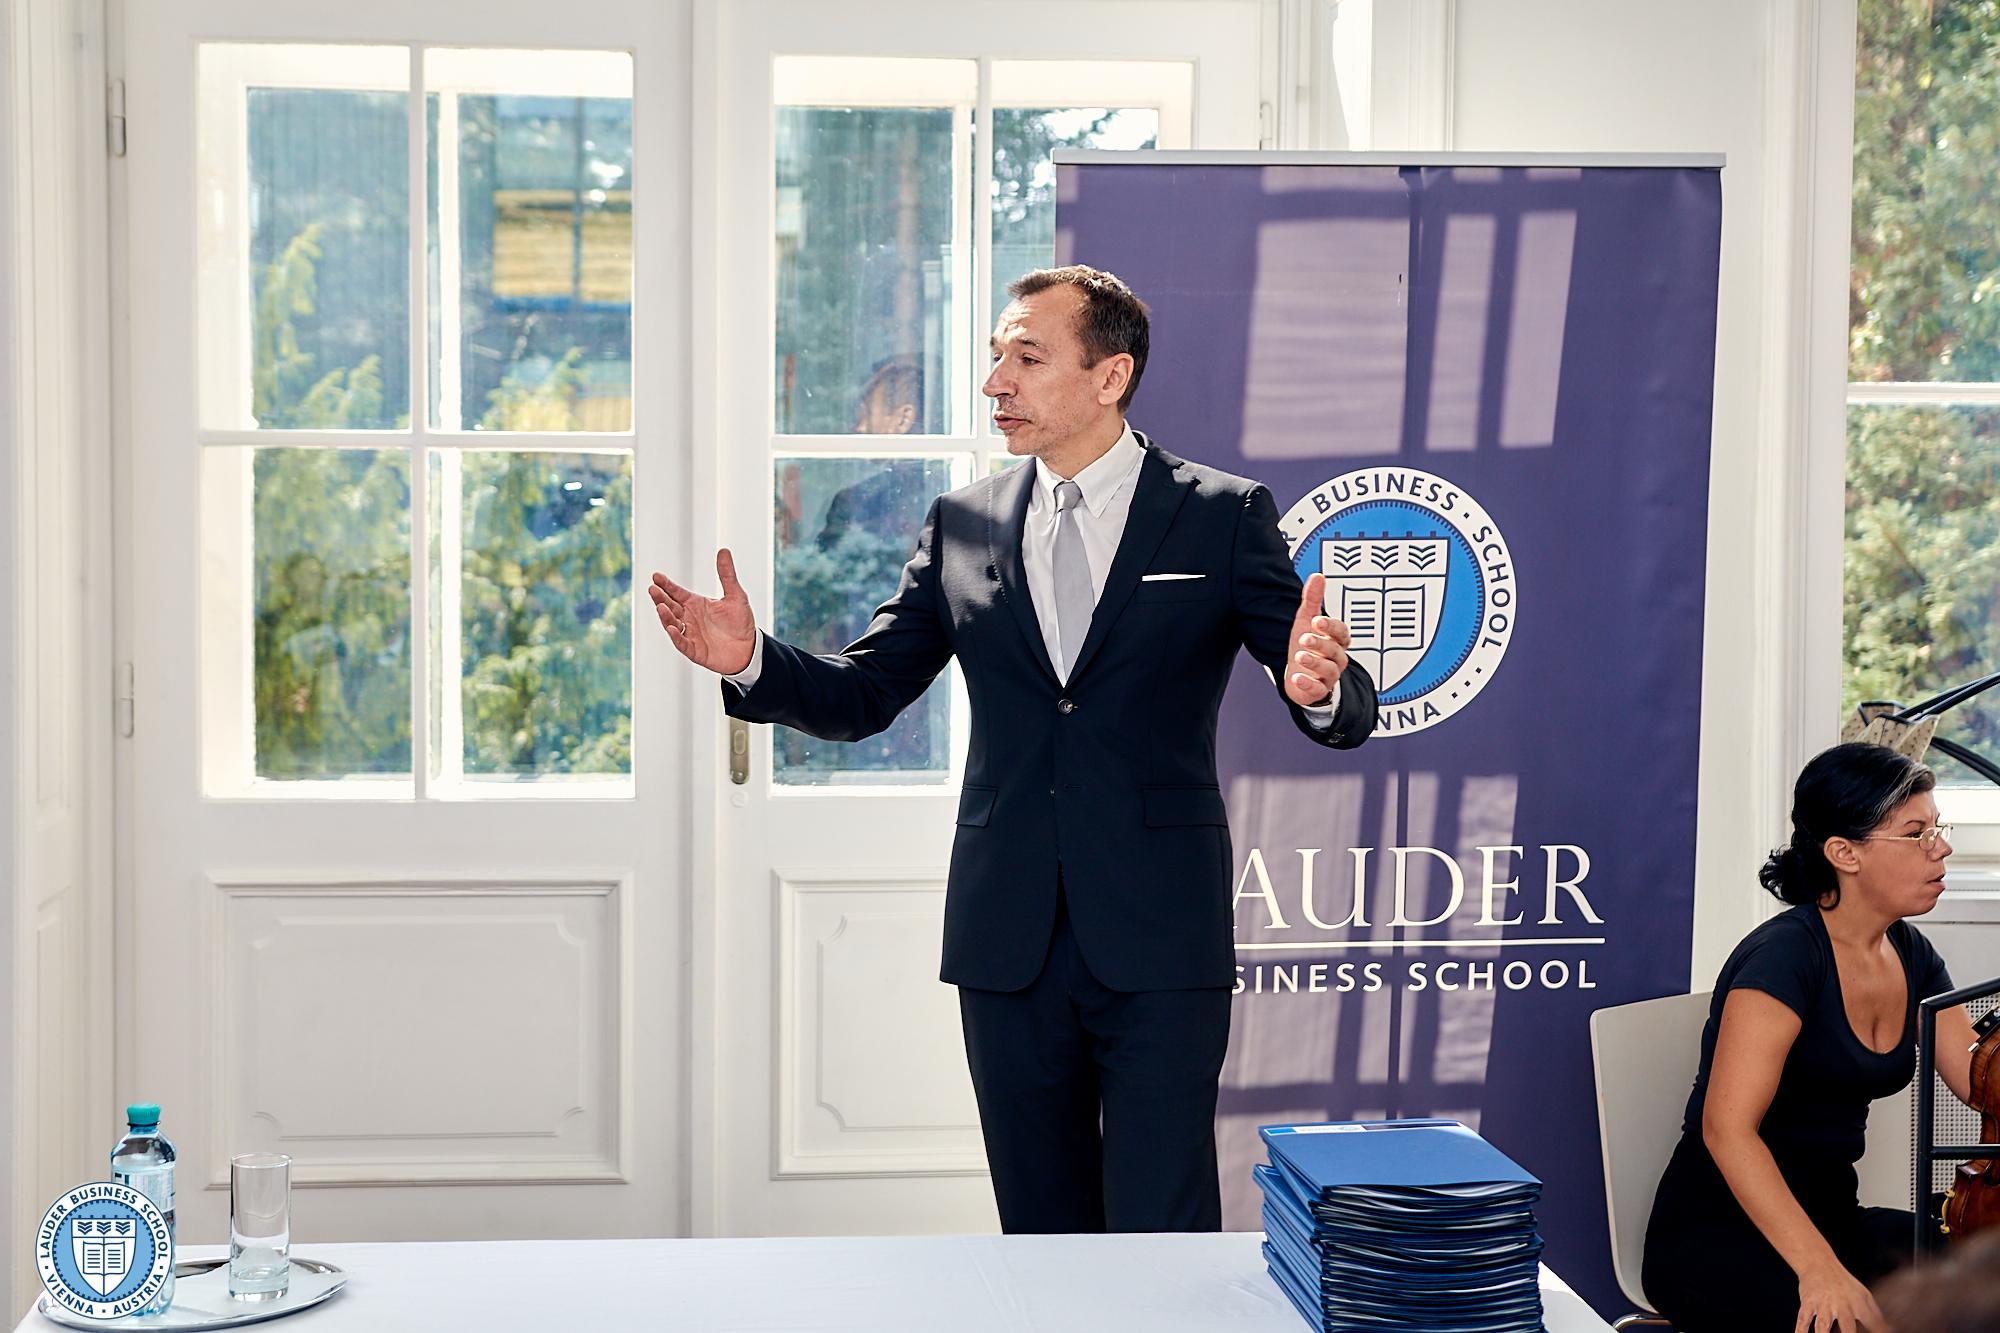 Executive Director Mr. Alexander Zirkler